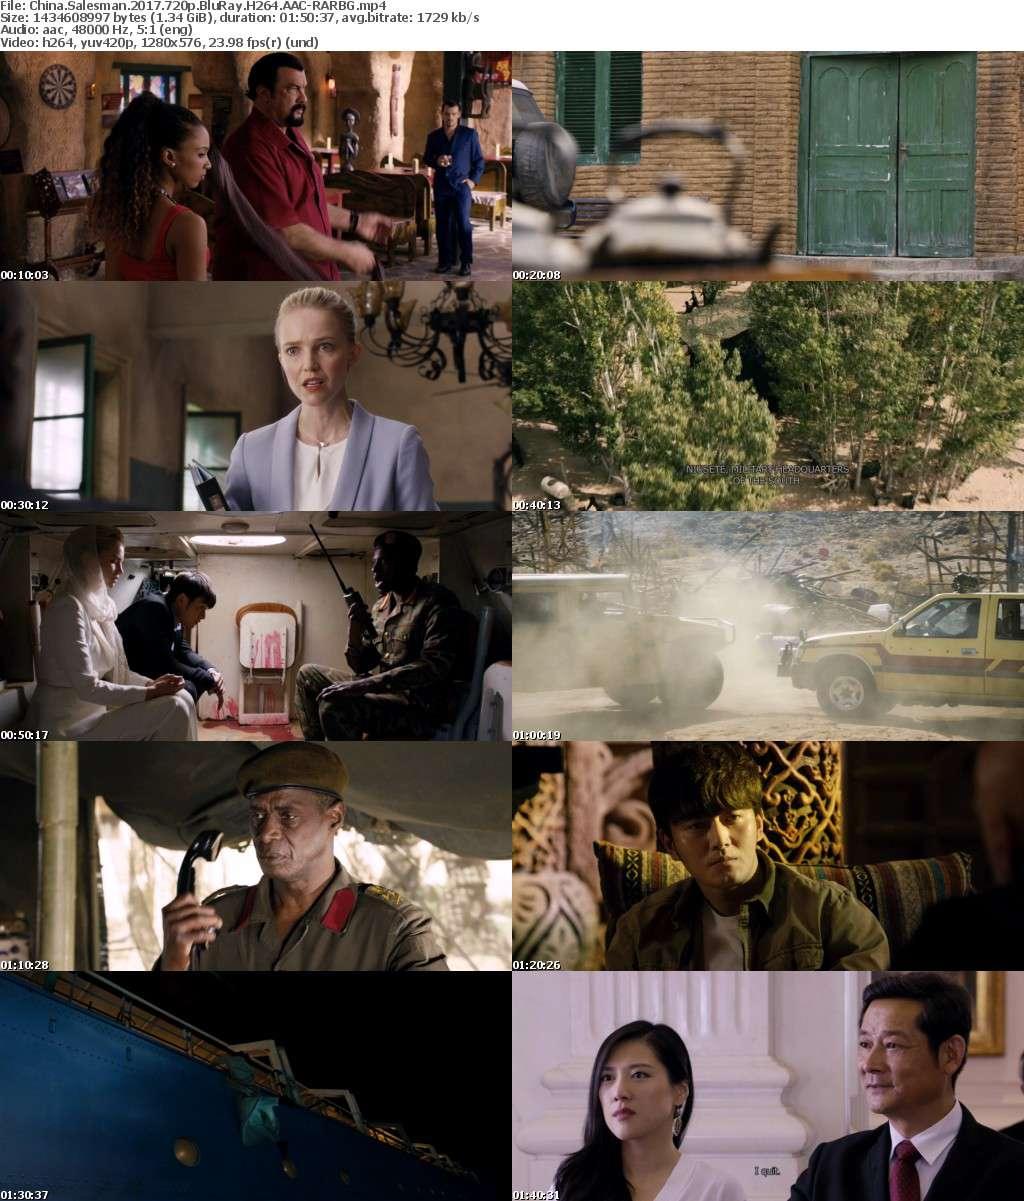 China Salesman (2017) 720p BluRay H264 AAC-RARBG